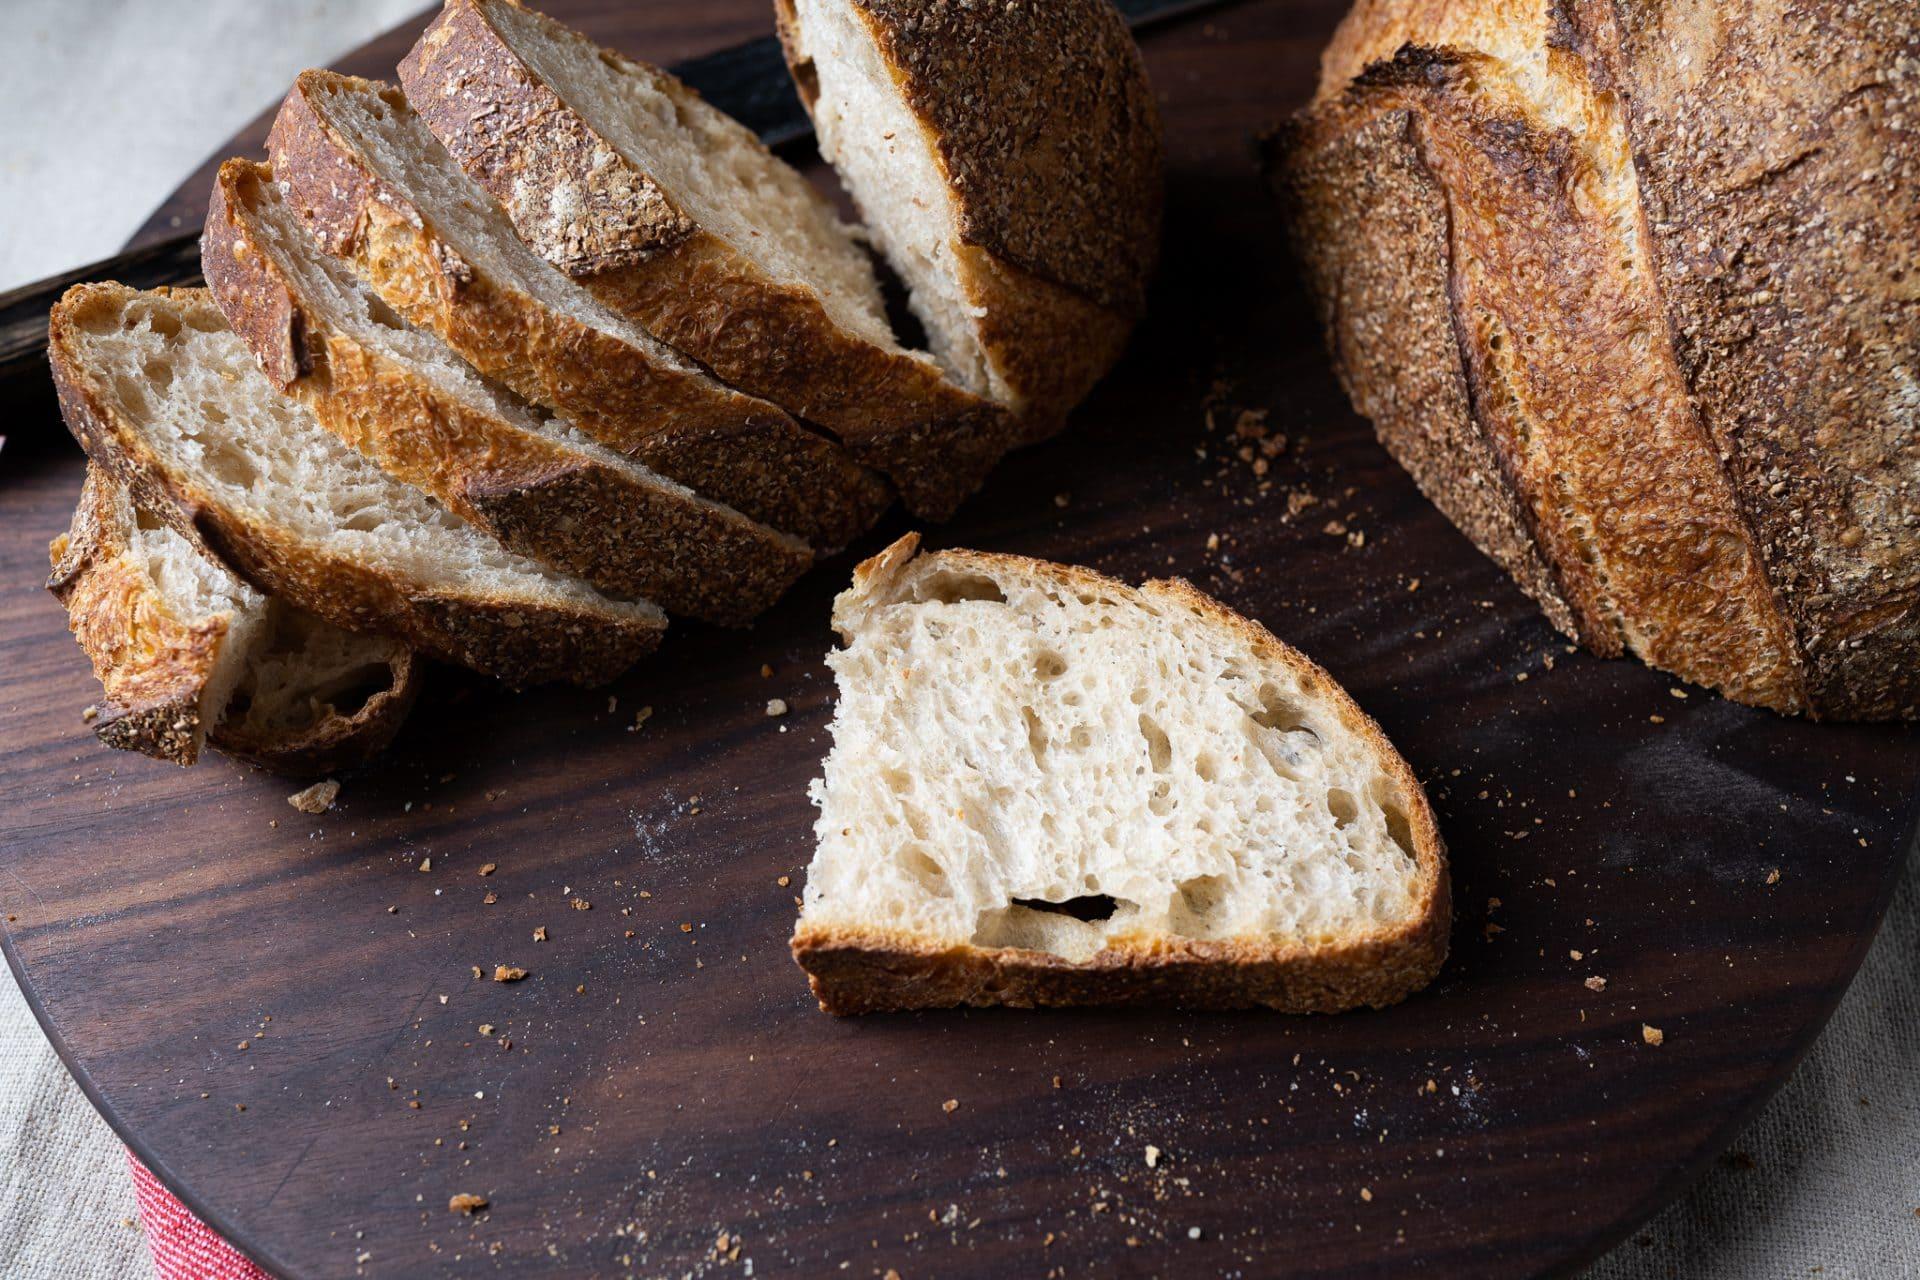 No-knead sourdough bread crumb